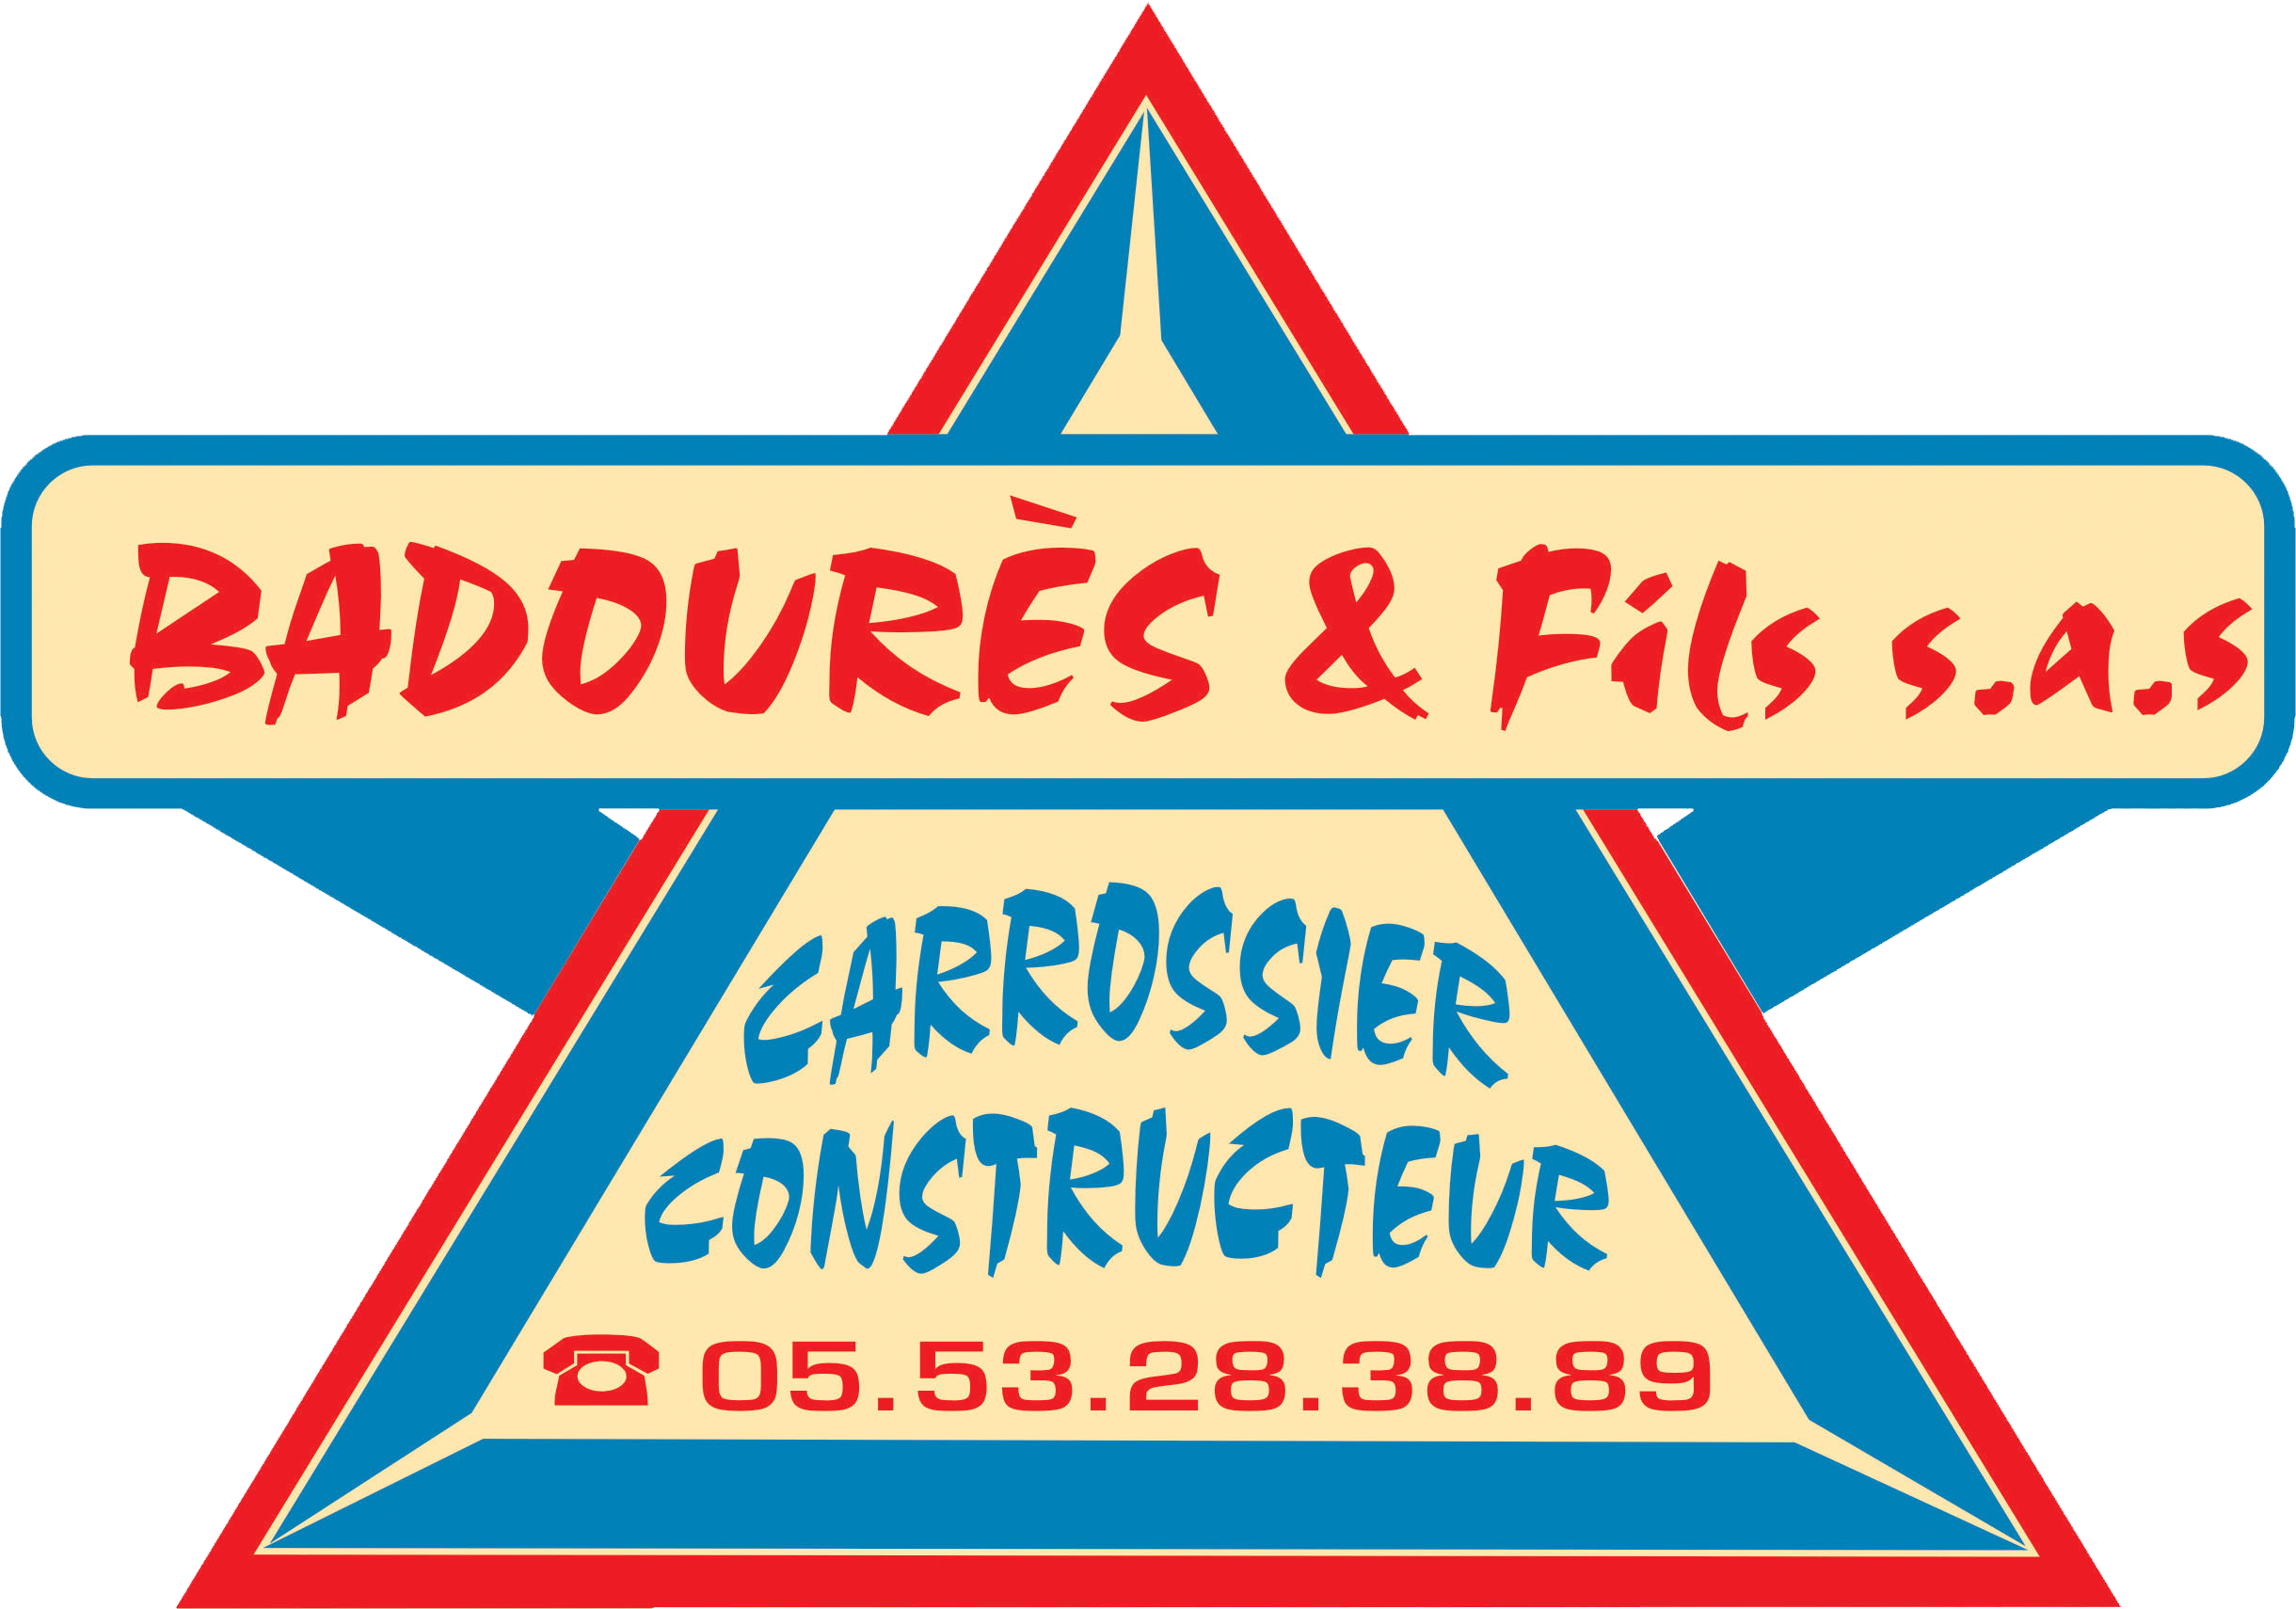 Carrossier Constructeur SAS BADOURES